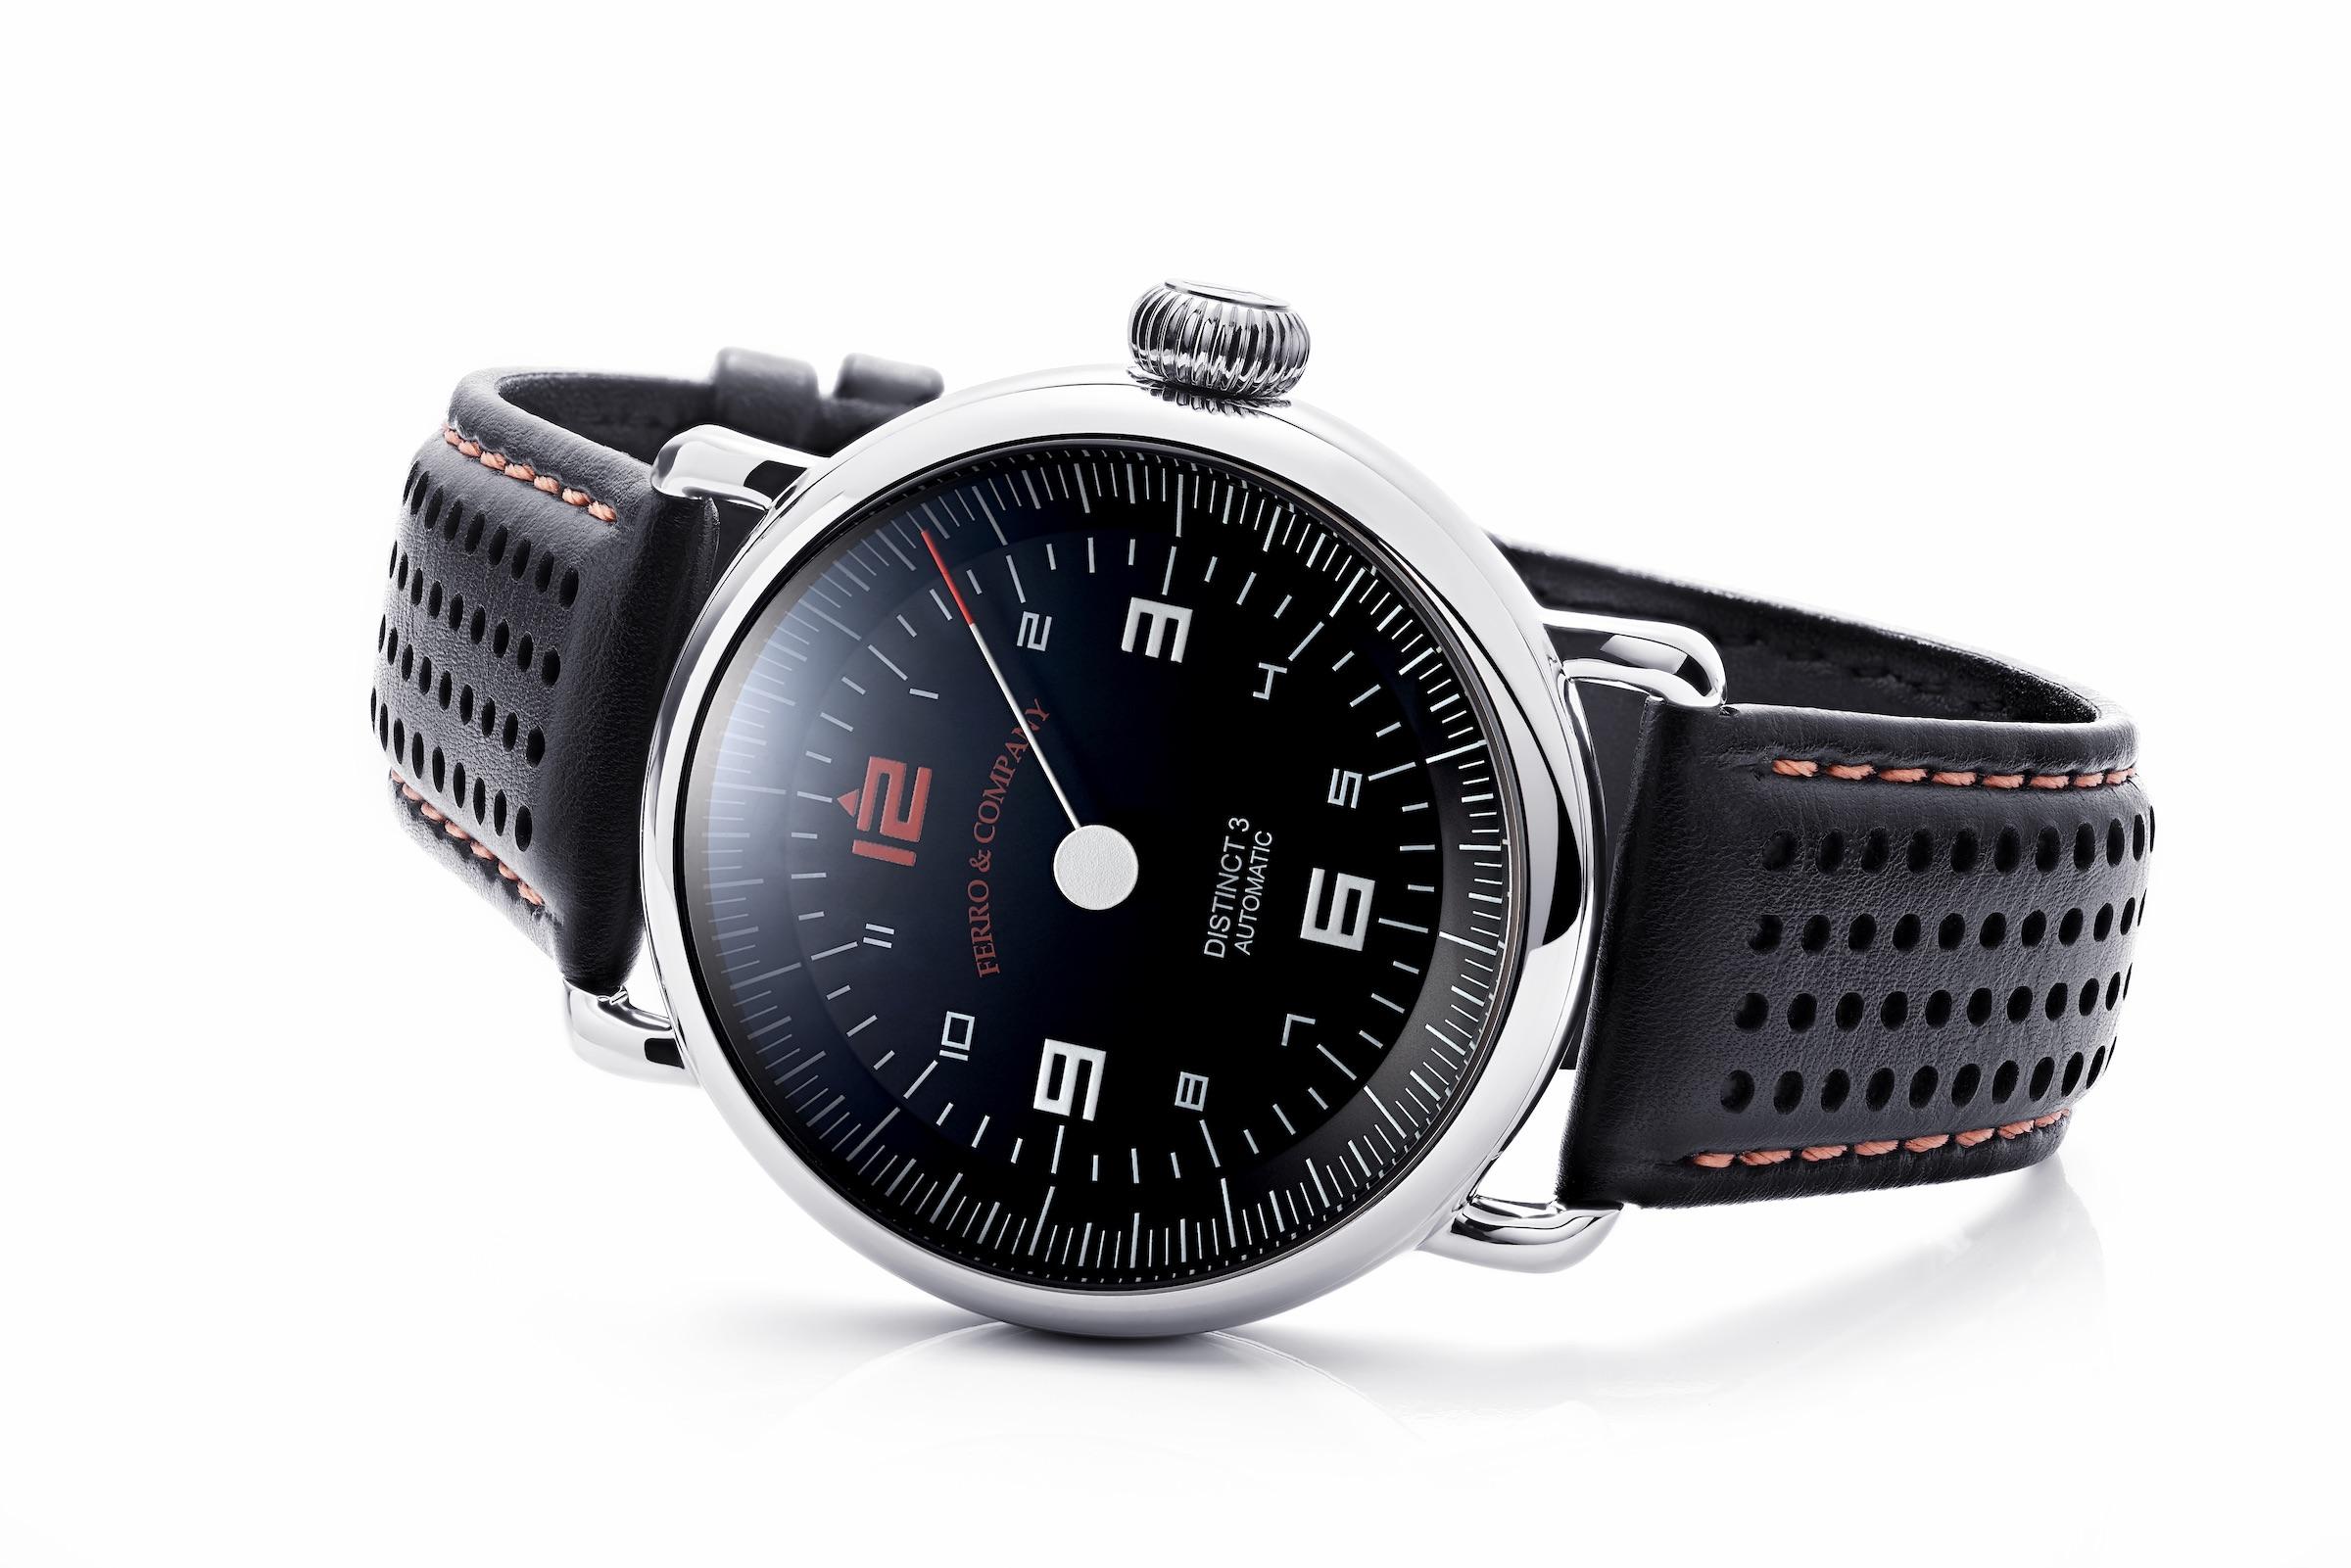 Ferro & Co. Distinct III Vintage Racing Watch